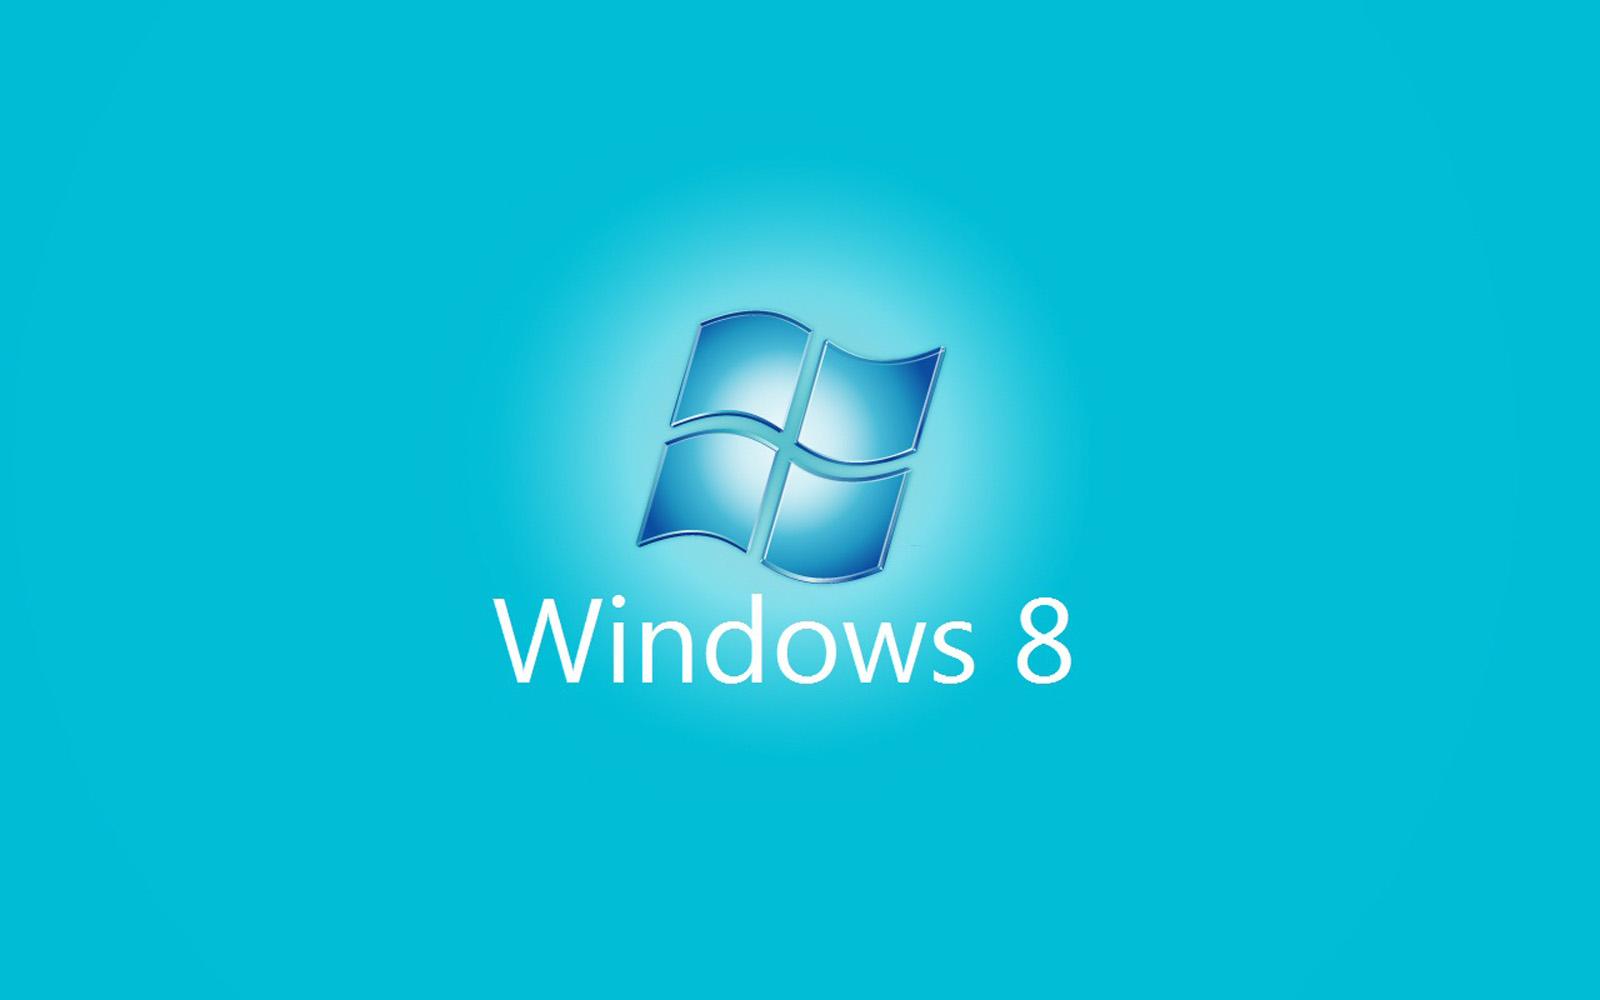 Windows 8 Wallpaper Free Download Wallpapers Hd Desktop: HD Wallpapers: Windows 8 Background Themes